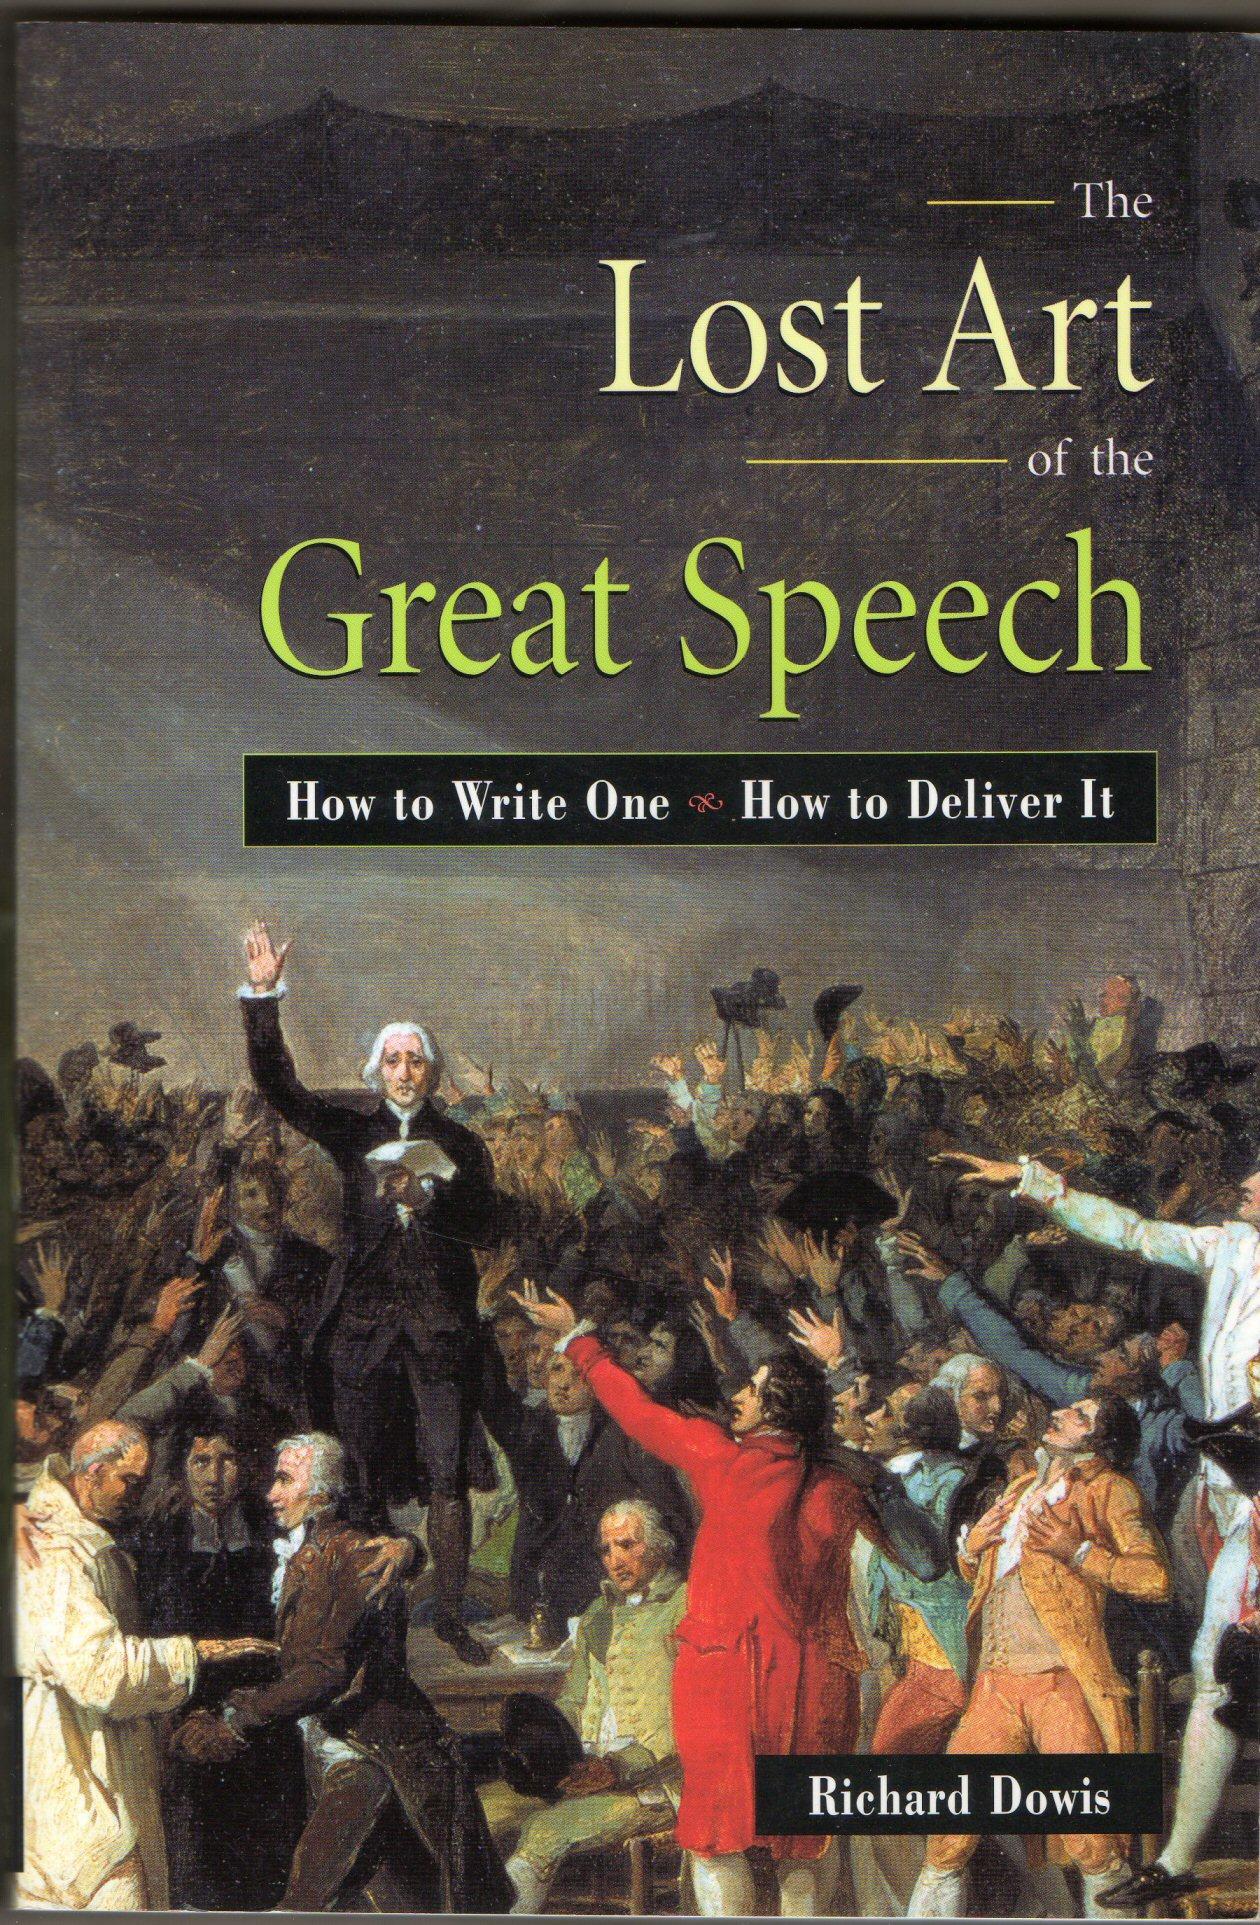 Lost Art of the Great Speech